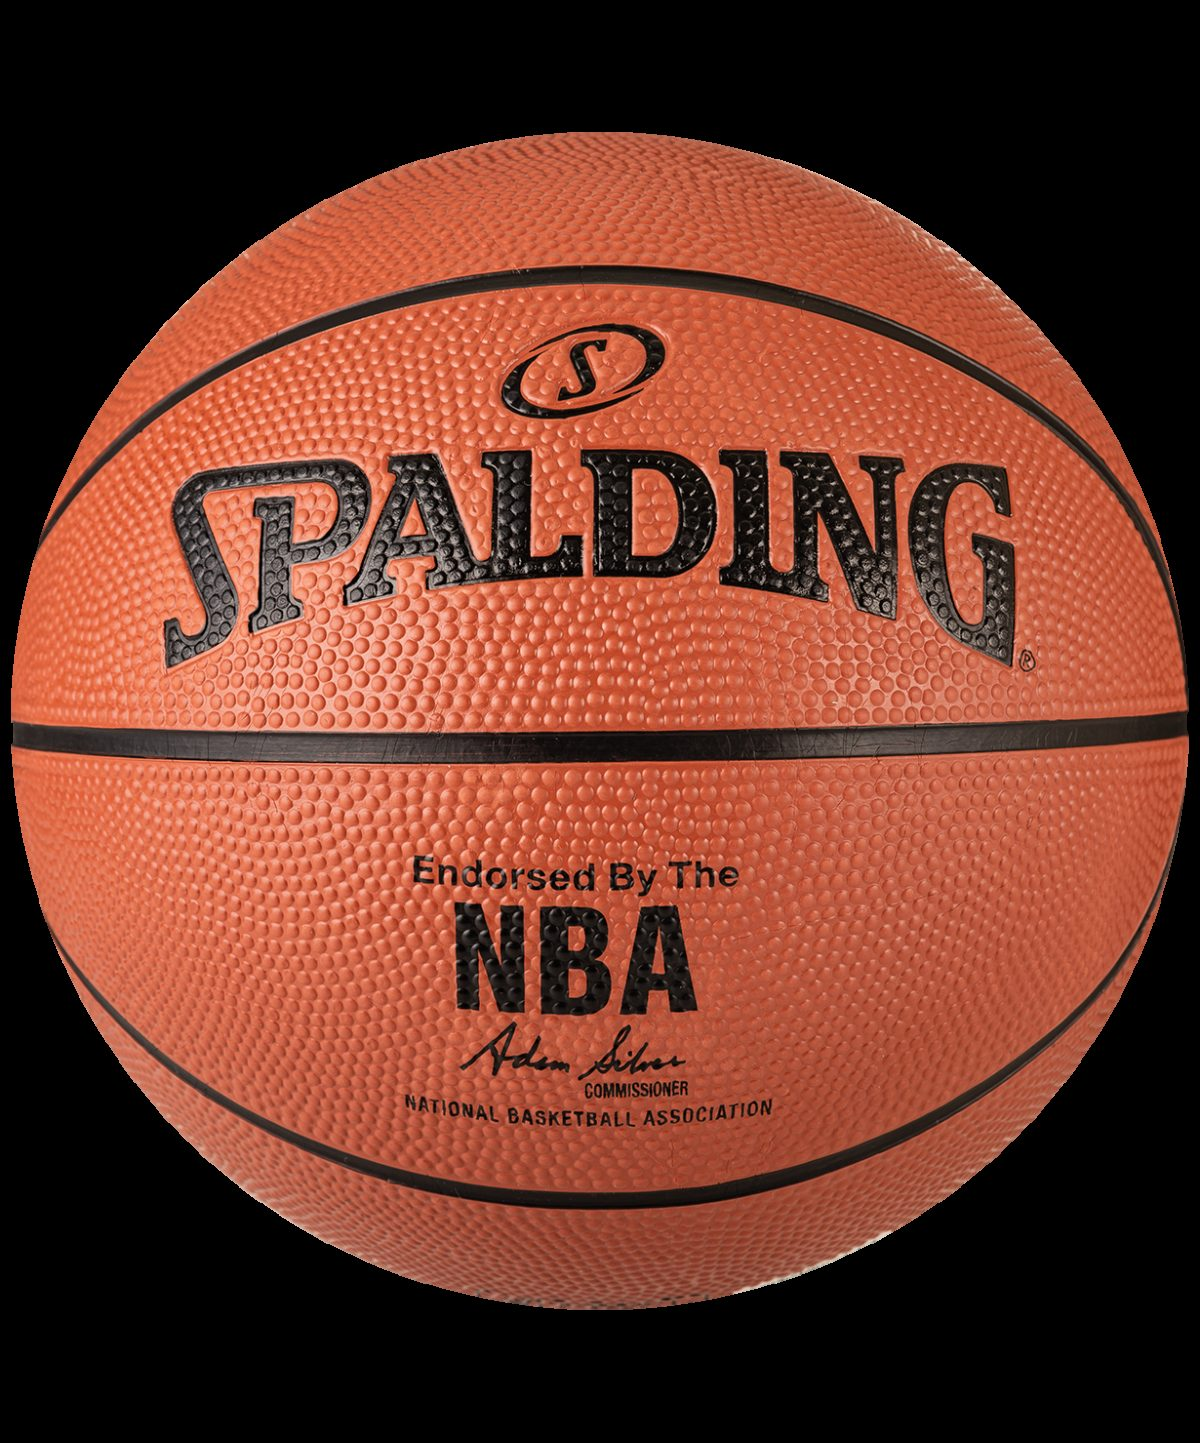 SPALDING NBA Silver Мяч баскетбольный  83016Z №7 - 2